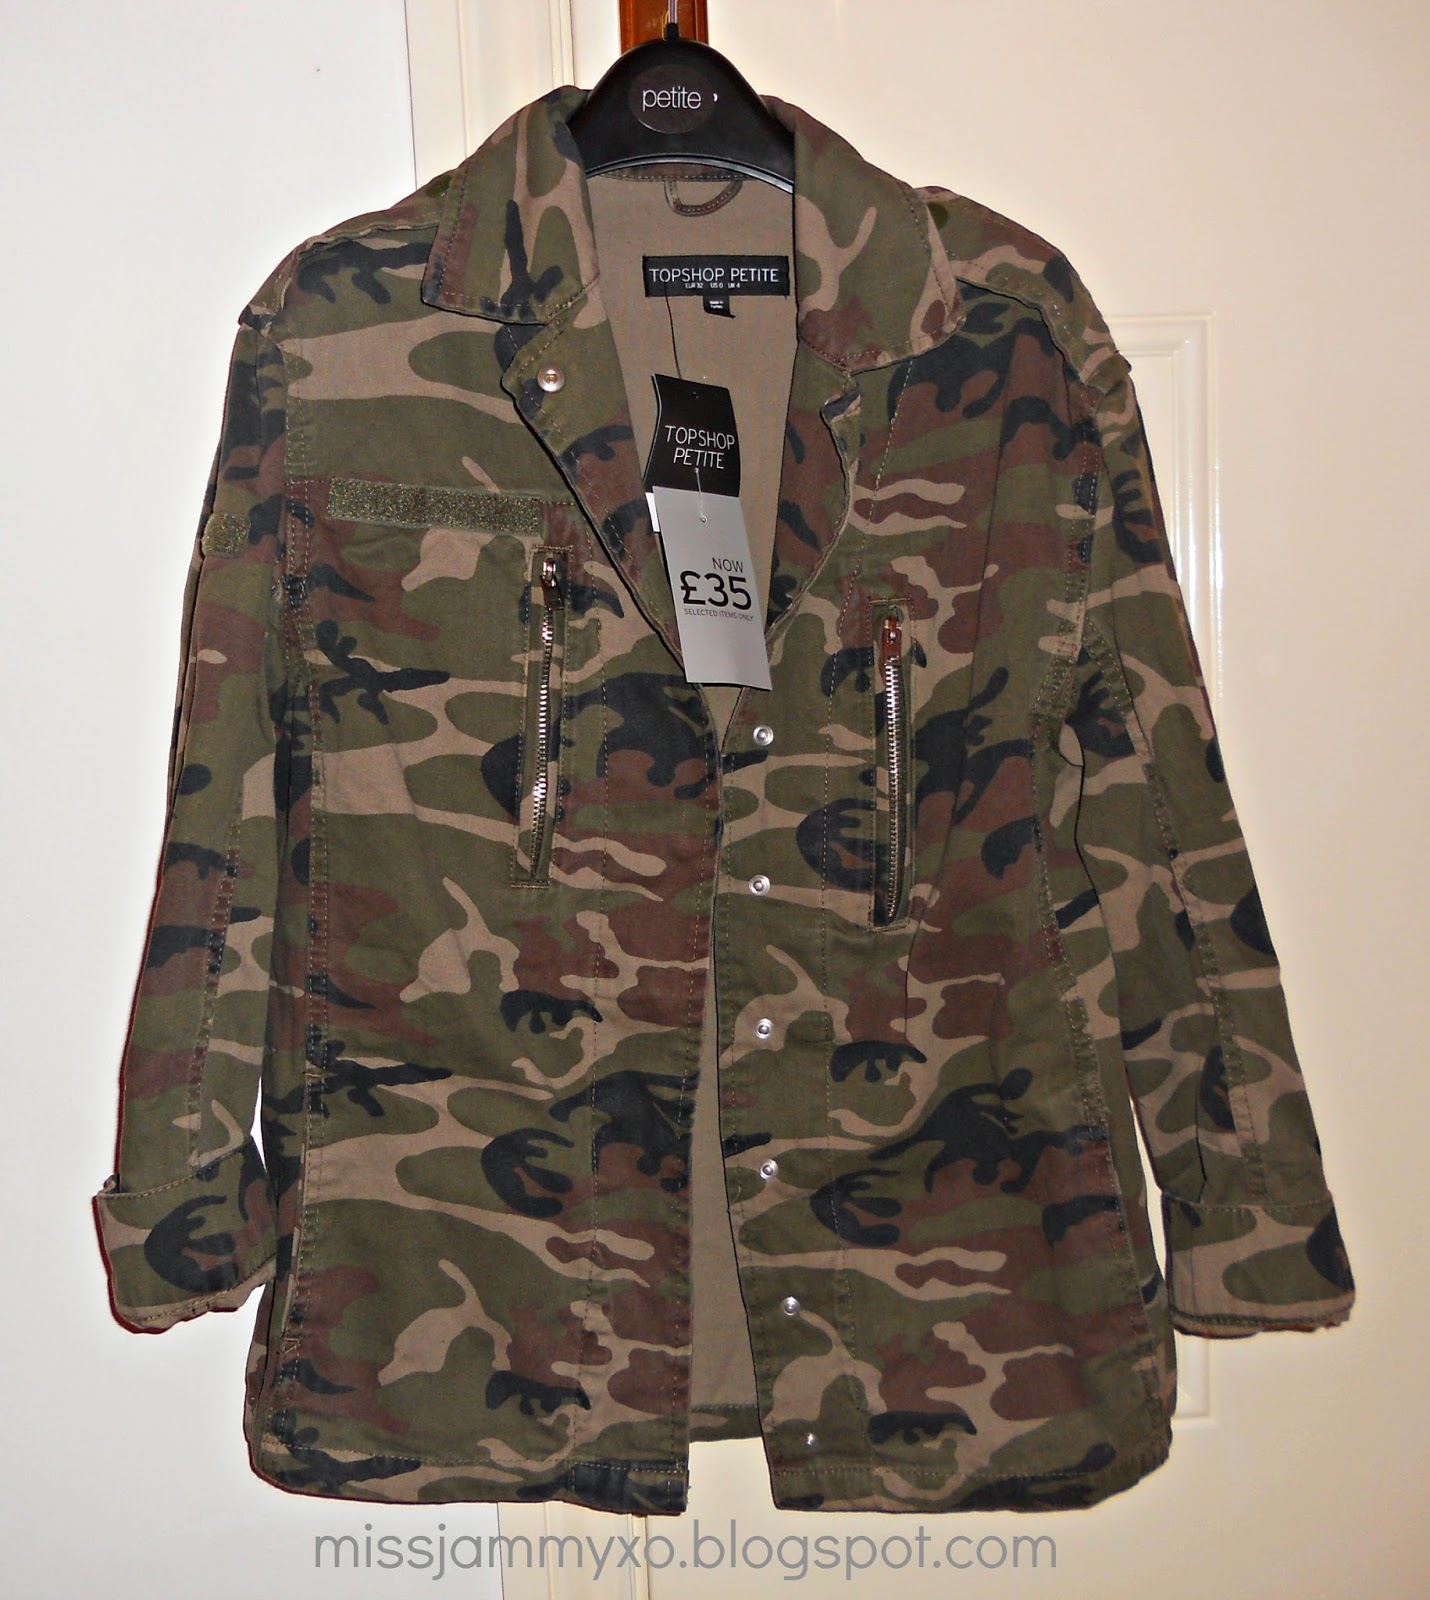 Camouflage jacke damen primark